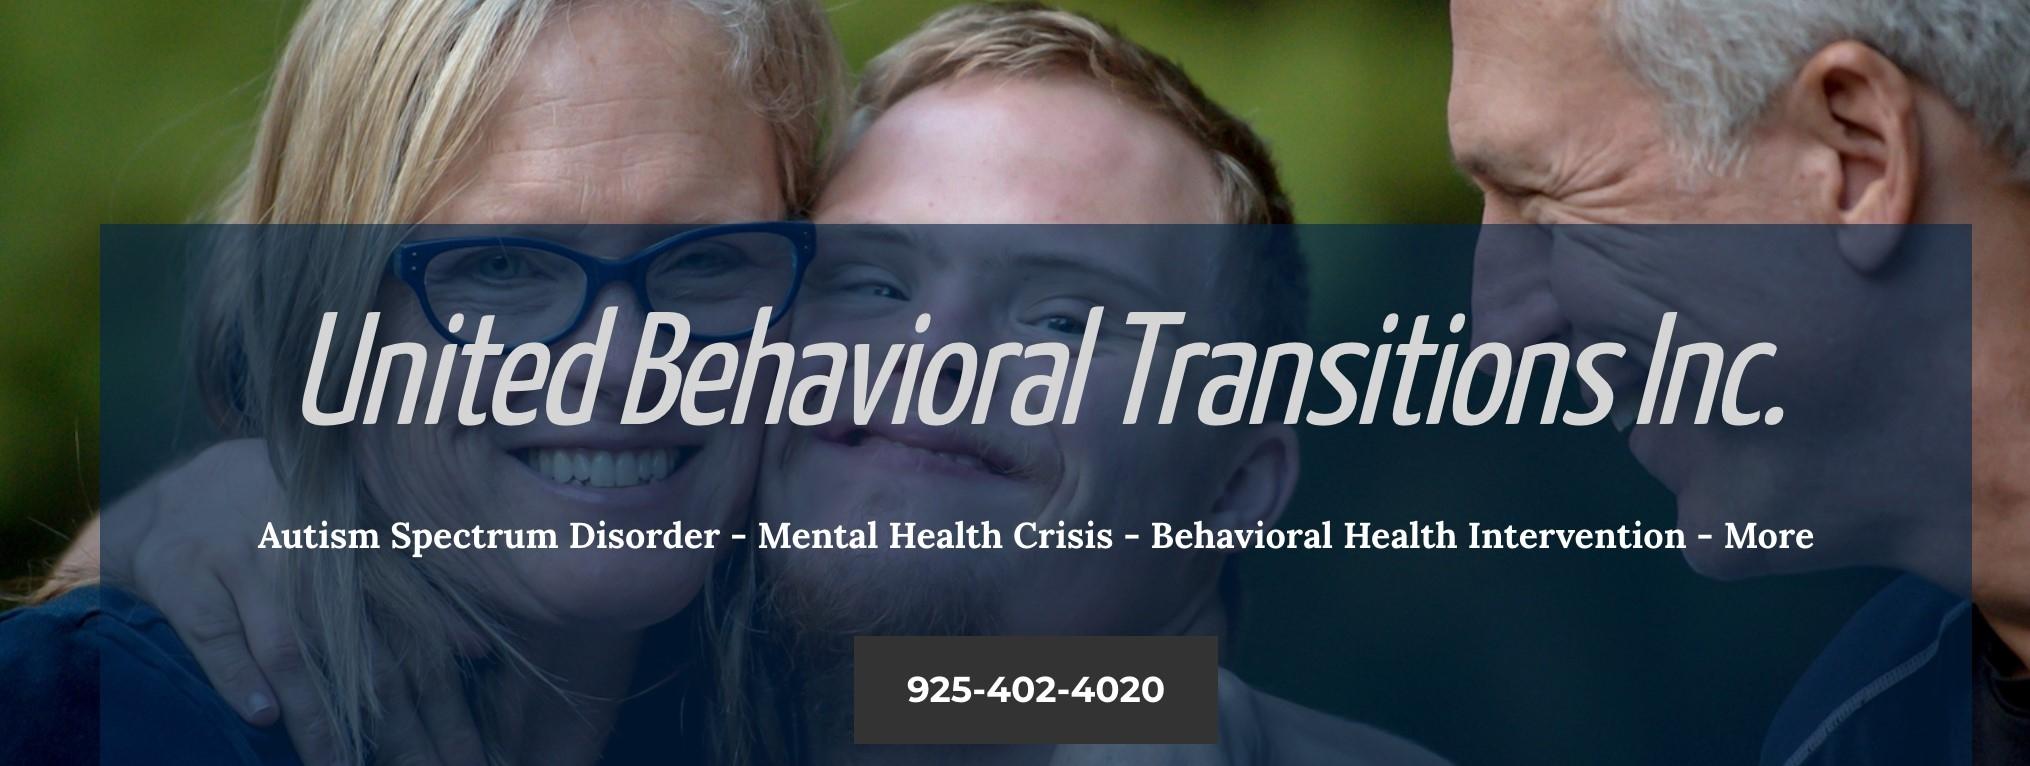 United Behavioral Transitions Inc (@unitedbehavioraltransitionsinc) Cover Image